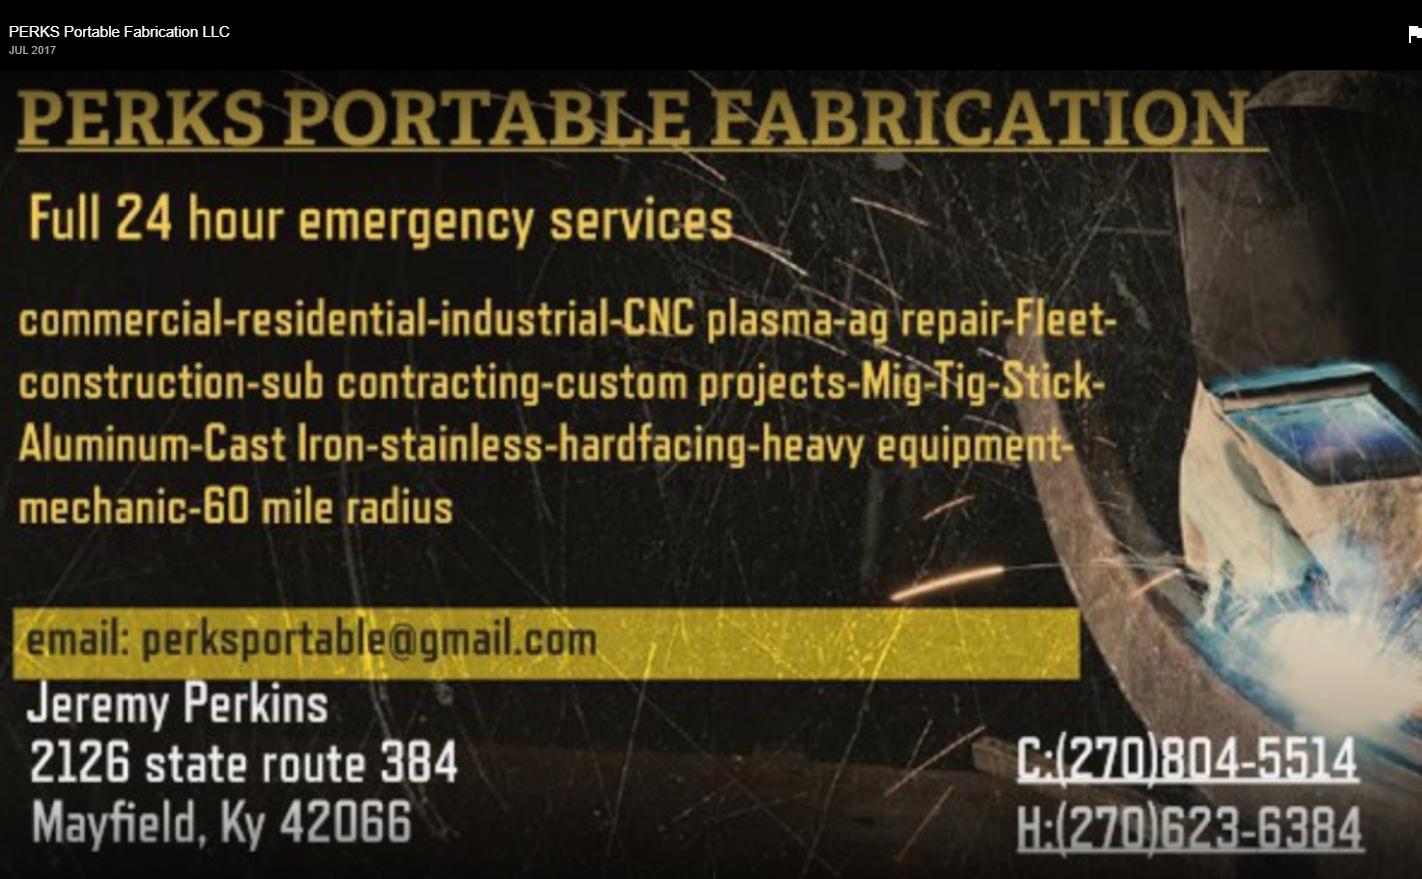 PERKS Portable Fabrication LLC image 9